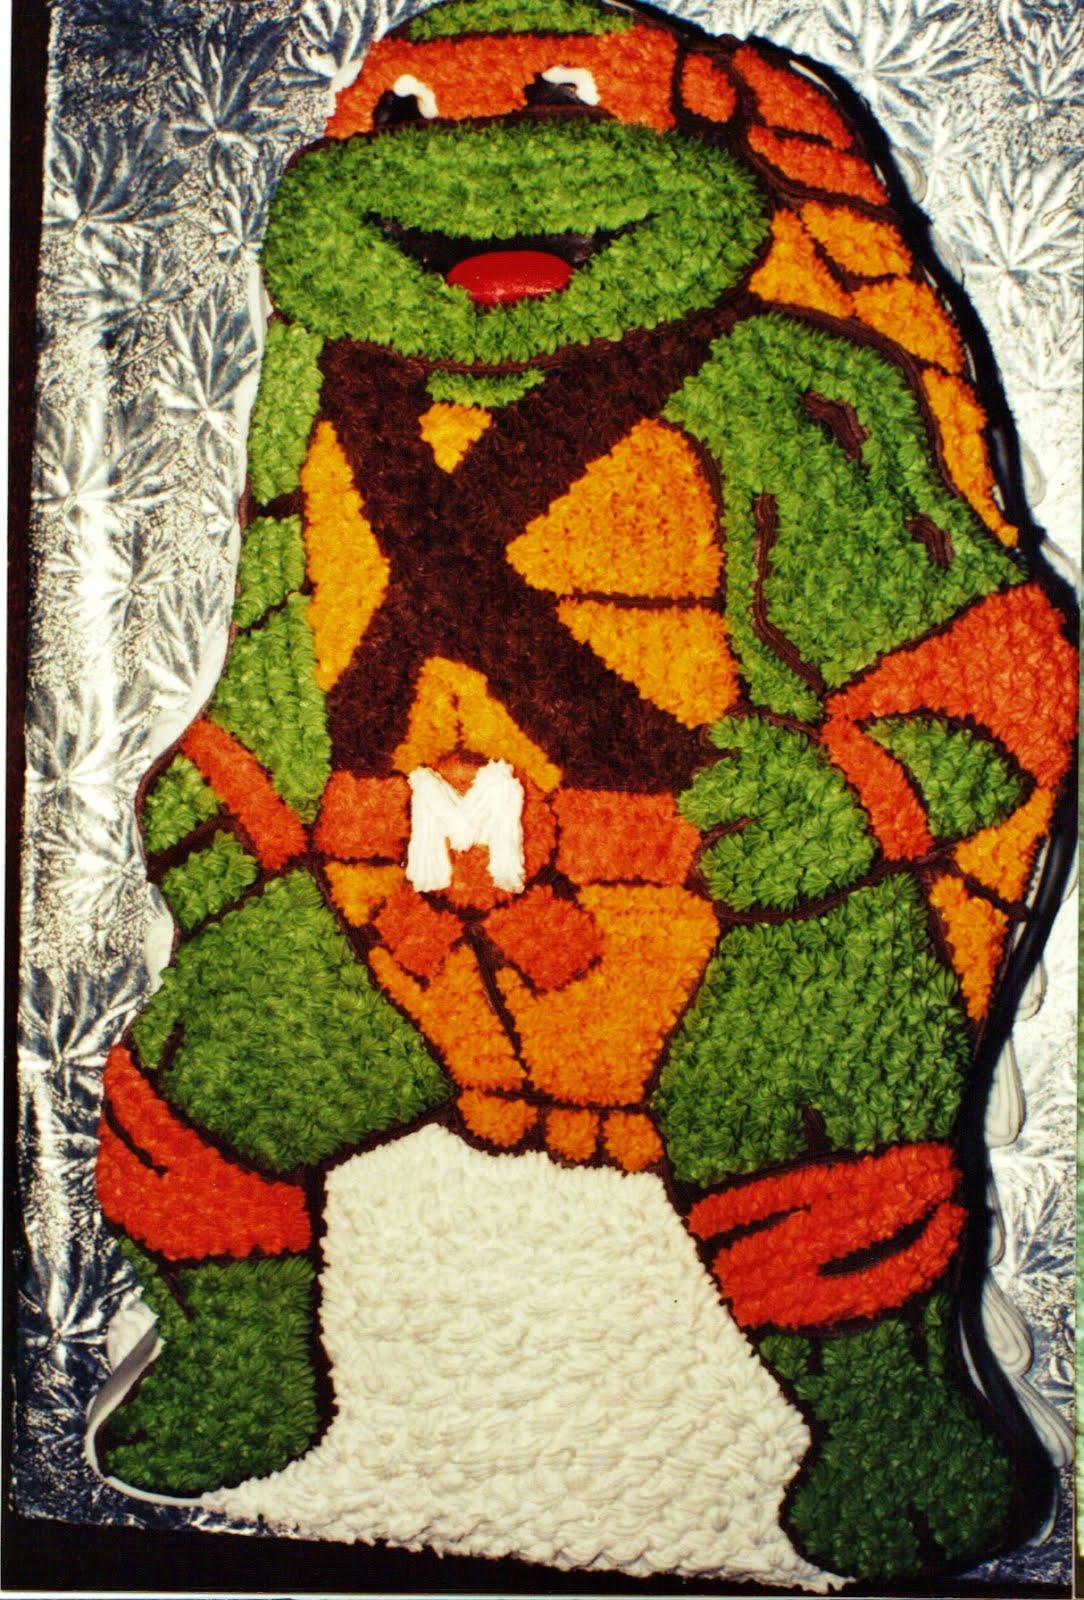 Teenage Mutant Ninja Turtle Michelangelo Cake